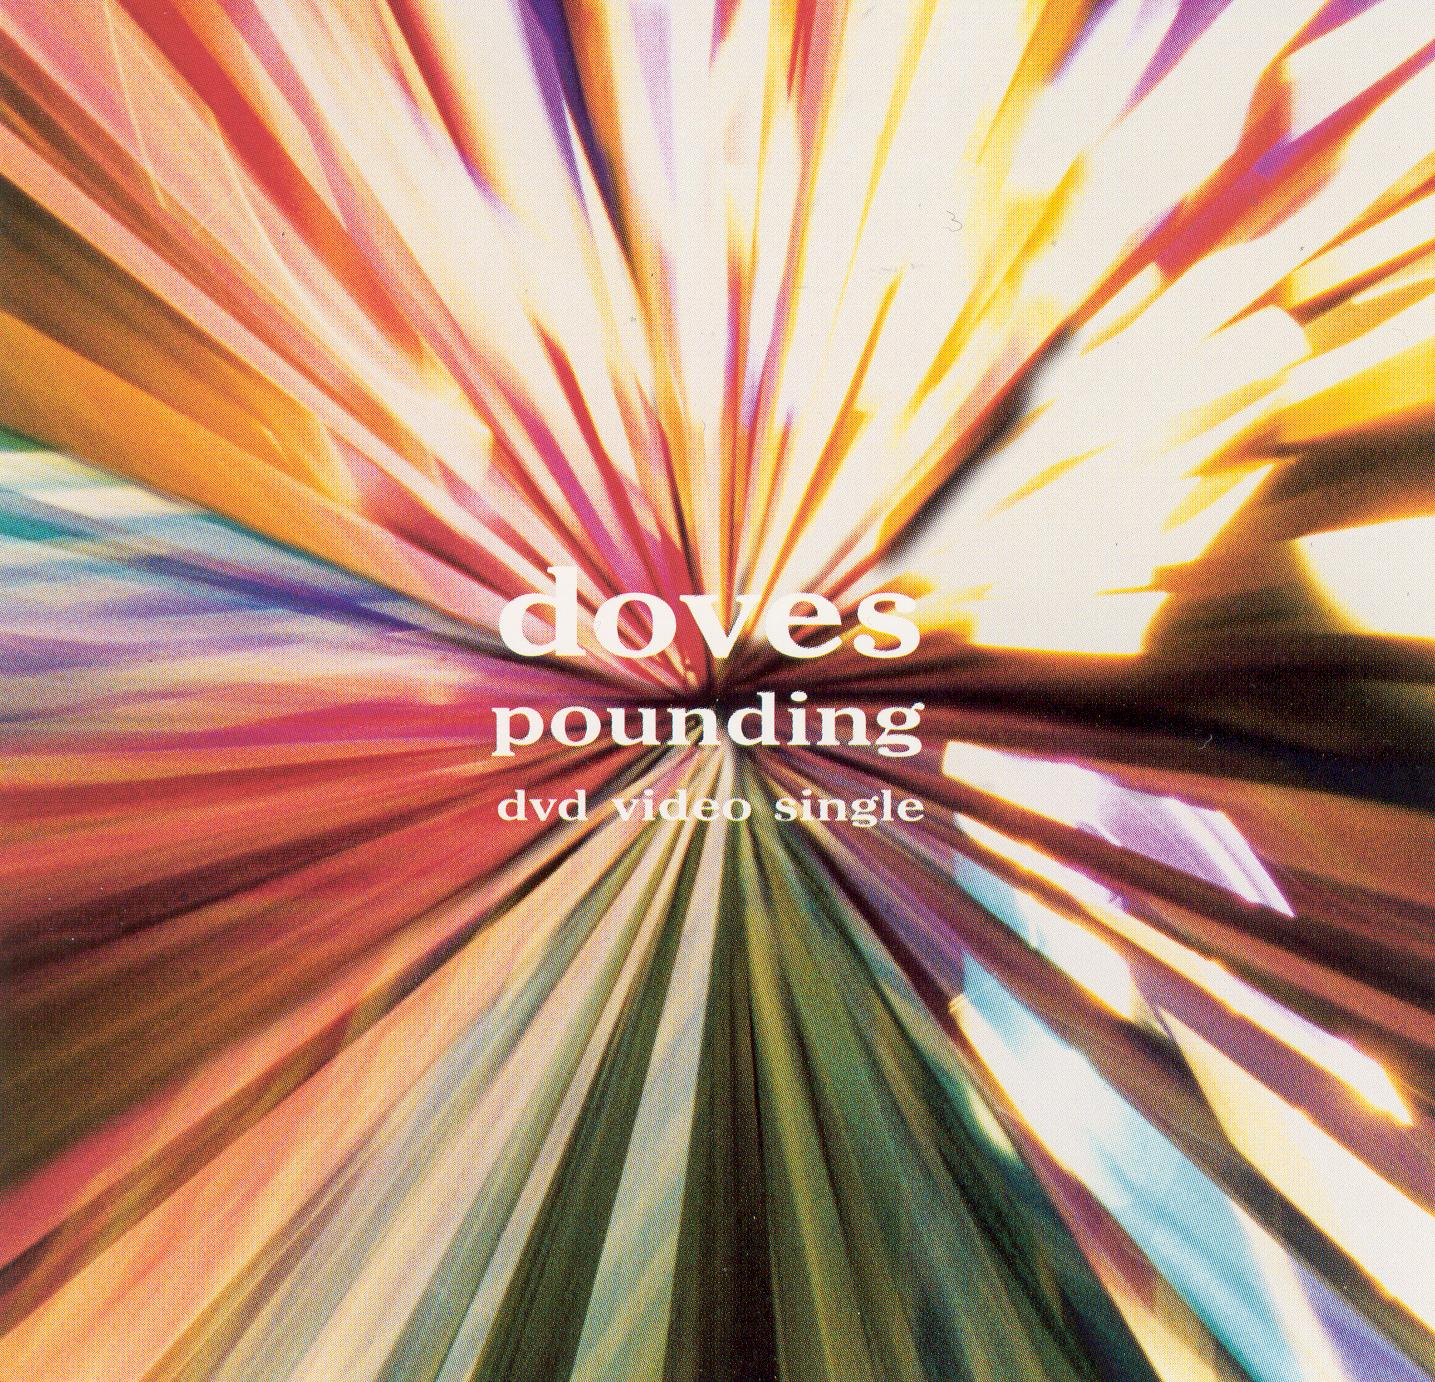 Doves: Pounding